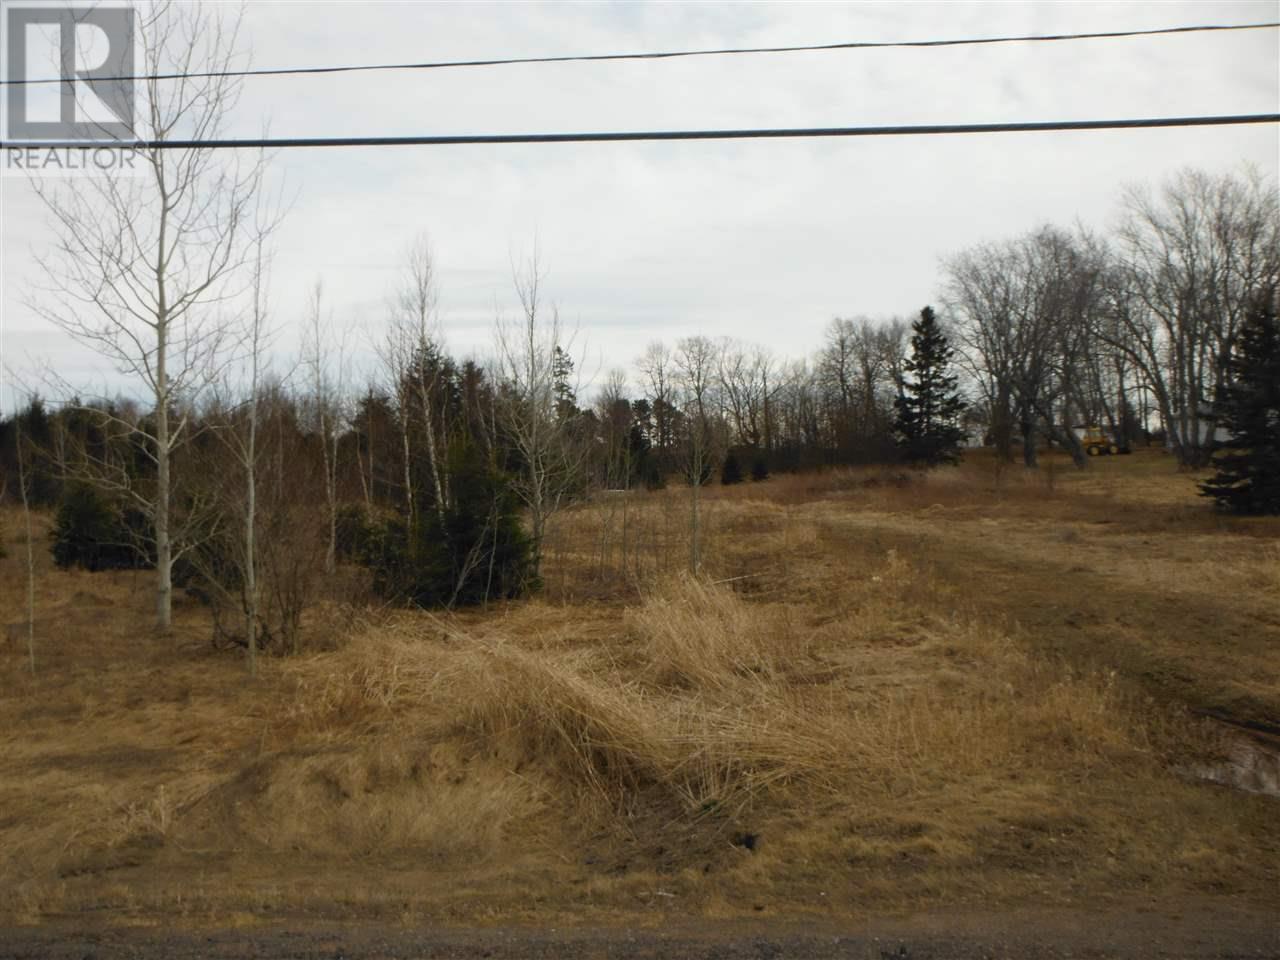 Lot 1-16 Royalty Junction Road, Charlottetown, Prince Edward Island  C1E 1Z2 - Photo 4 - 202006111